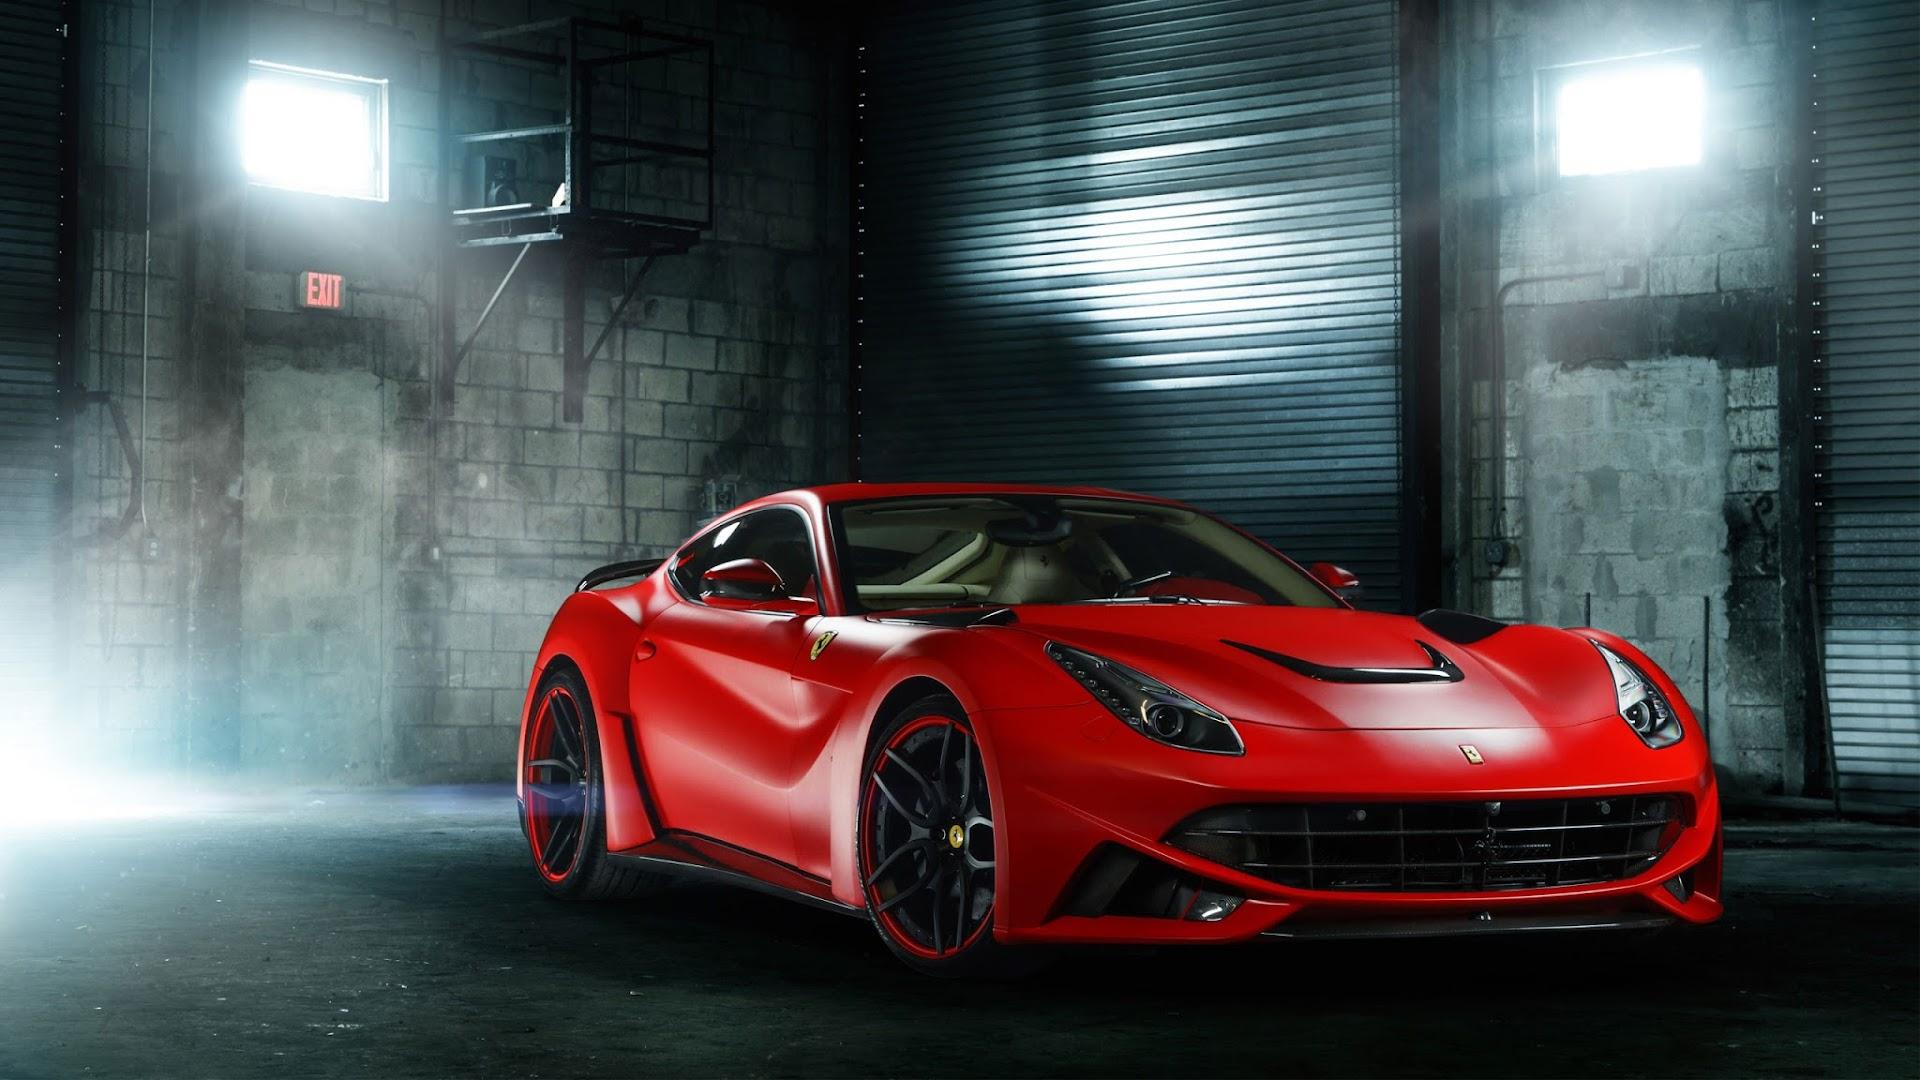 Papel De Parede Carro Esportivo Ferrari F12 Papel De